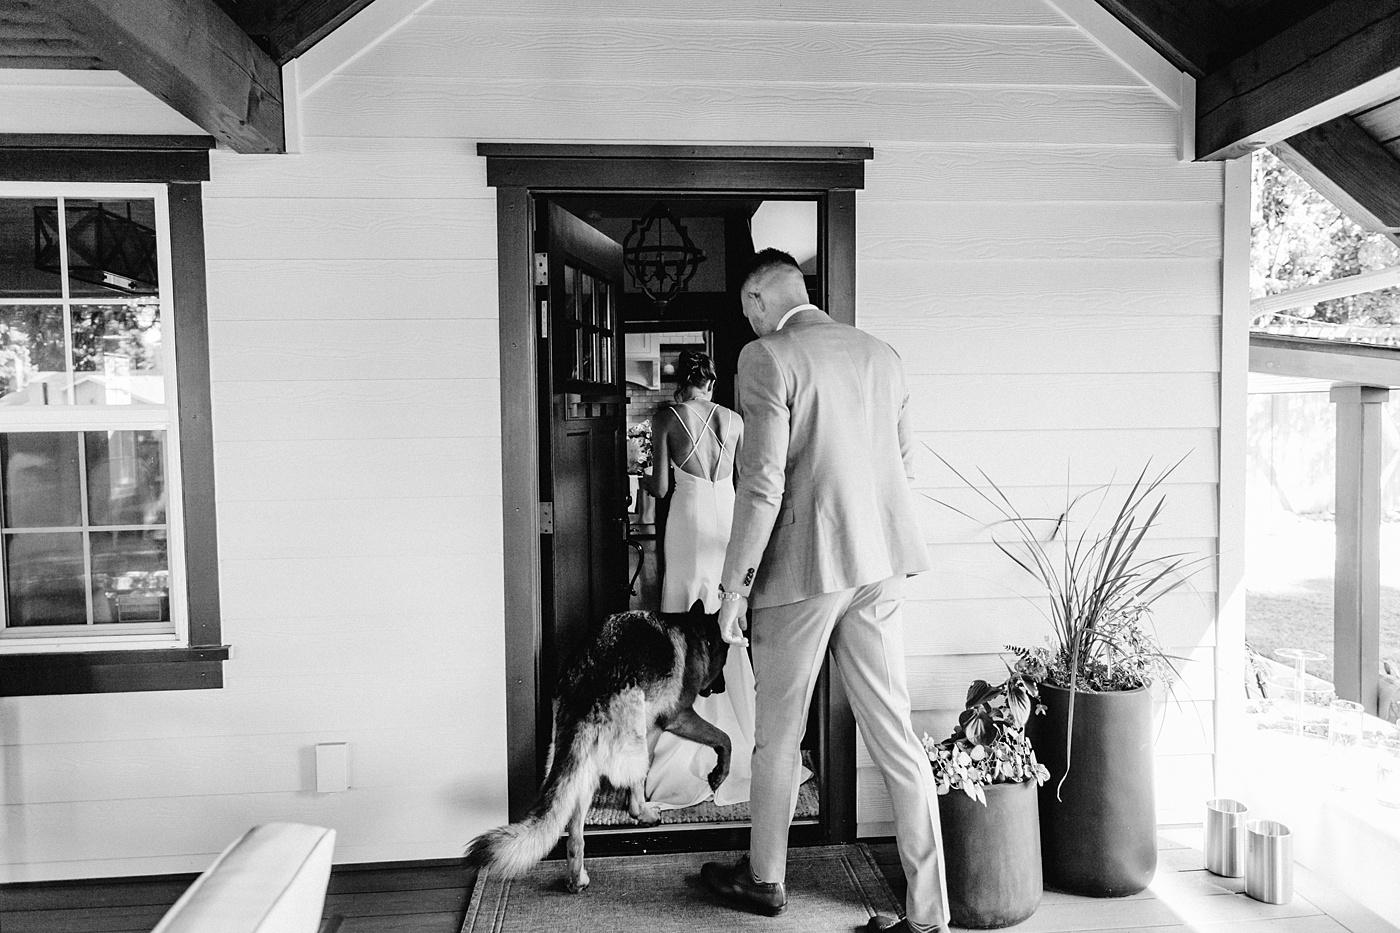 portland elopement photographer photos at home intimate wedding